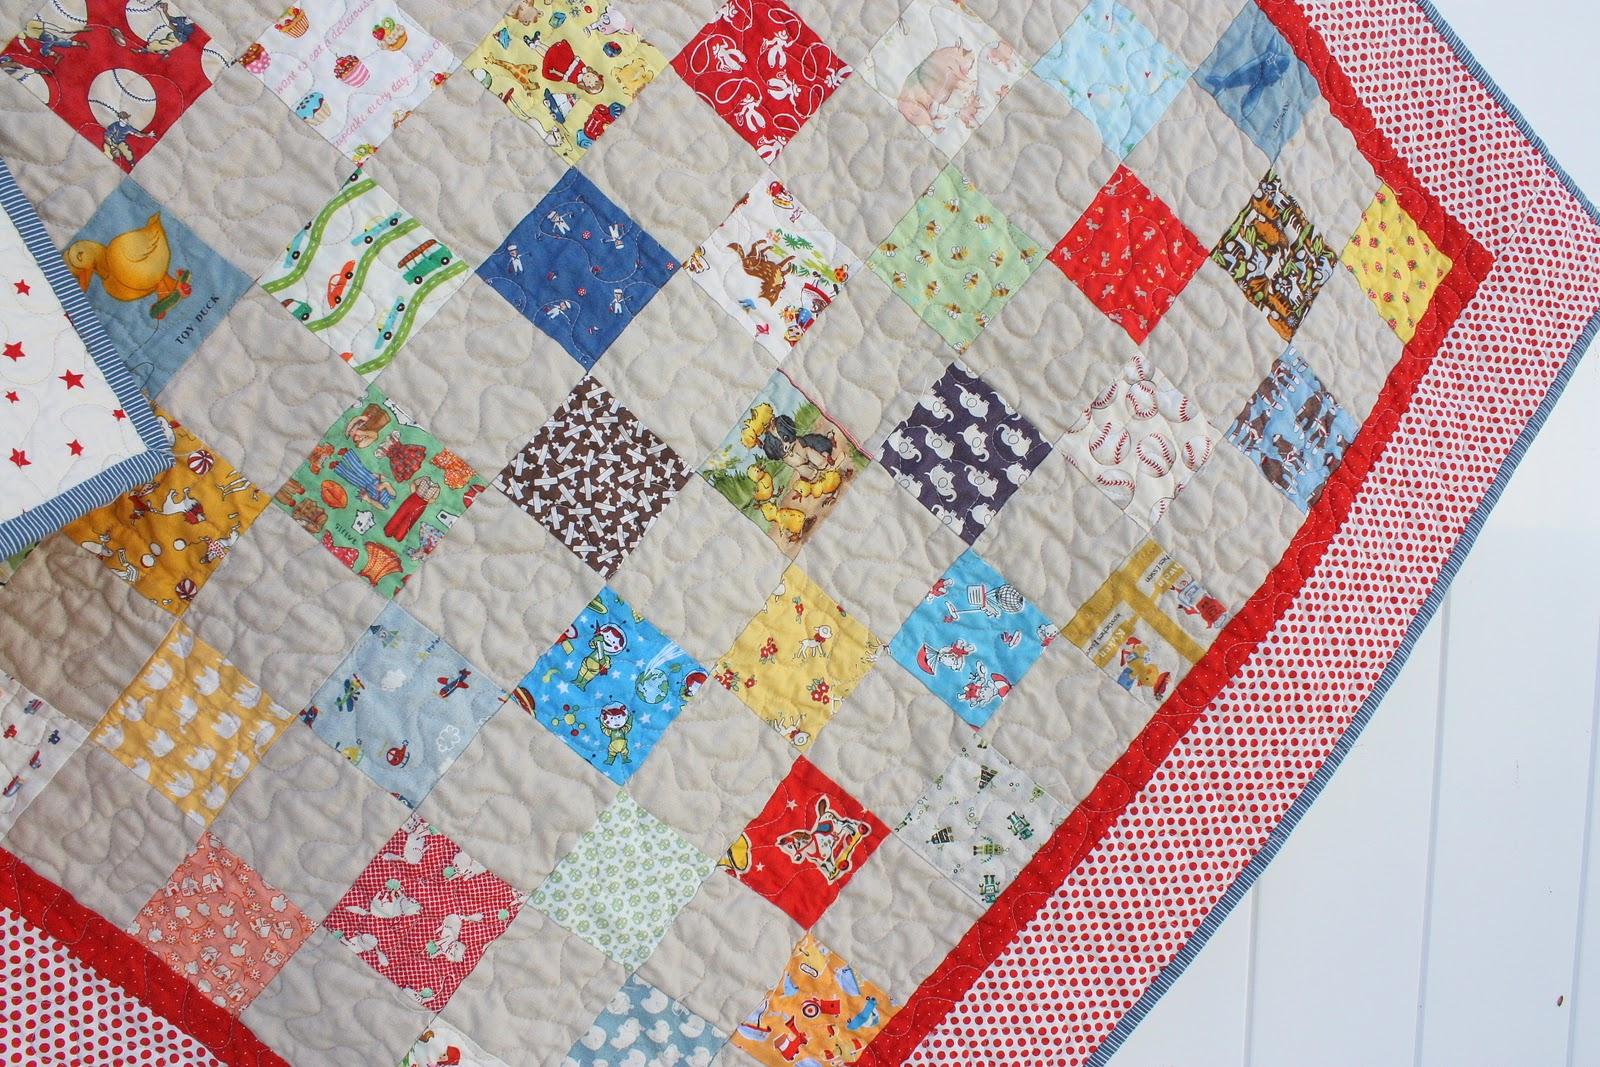 Gramma's Quilts